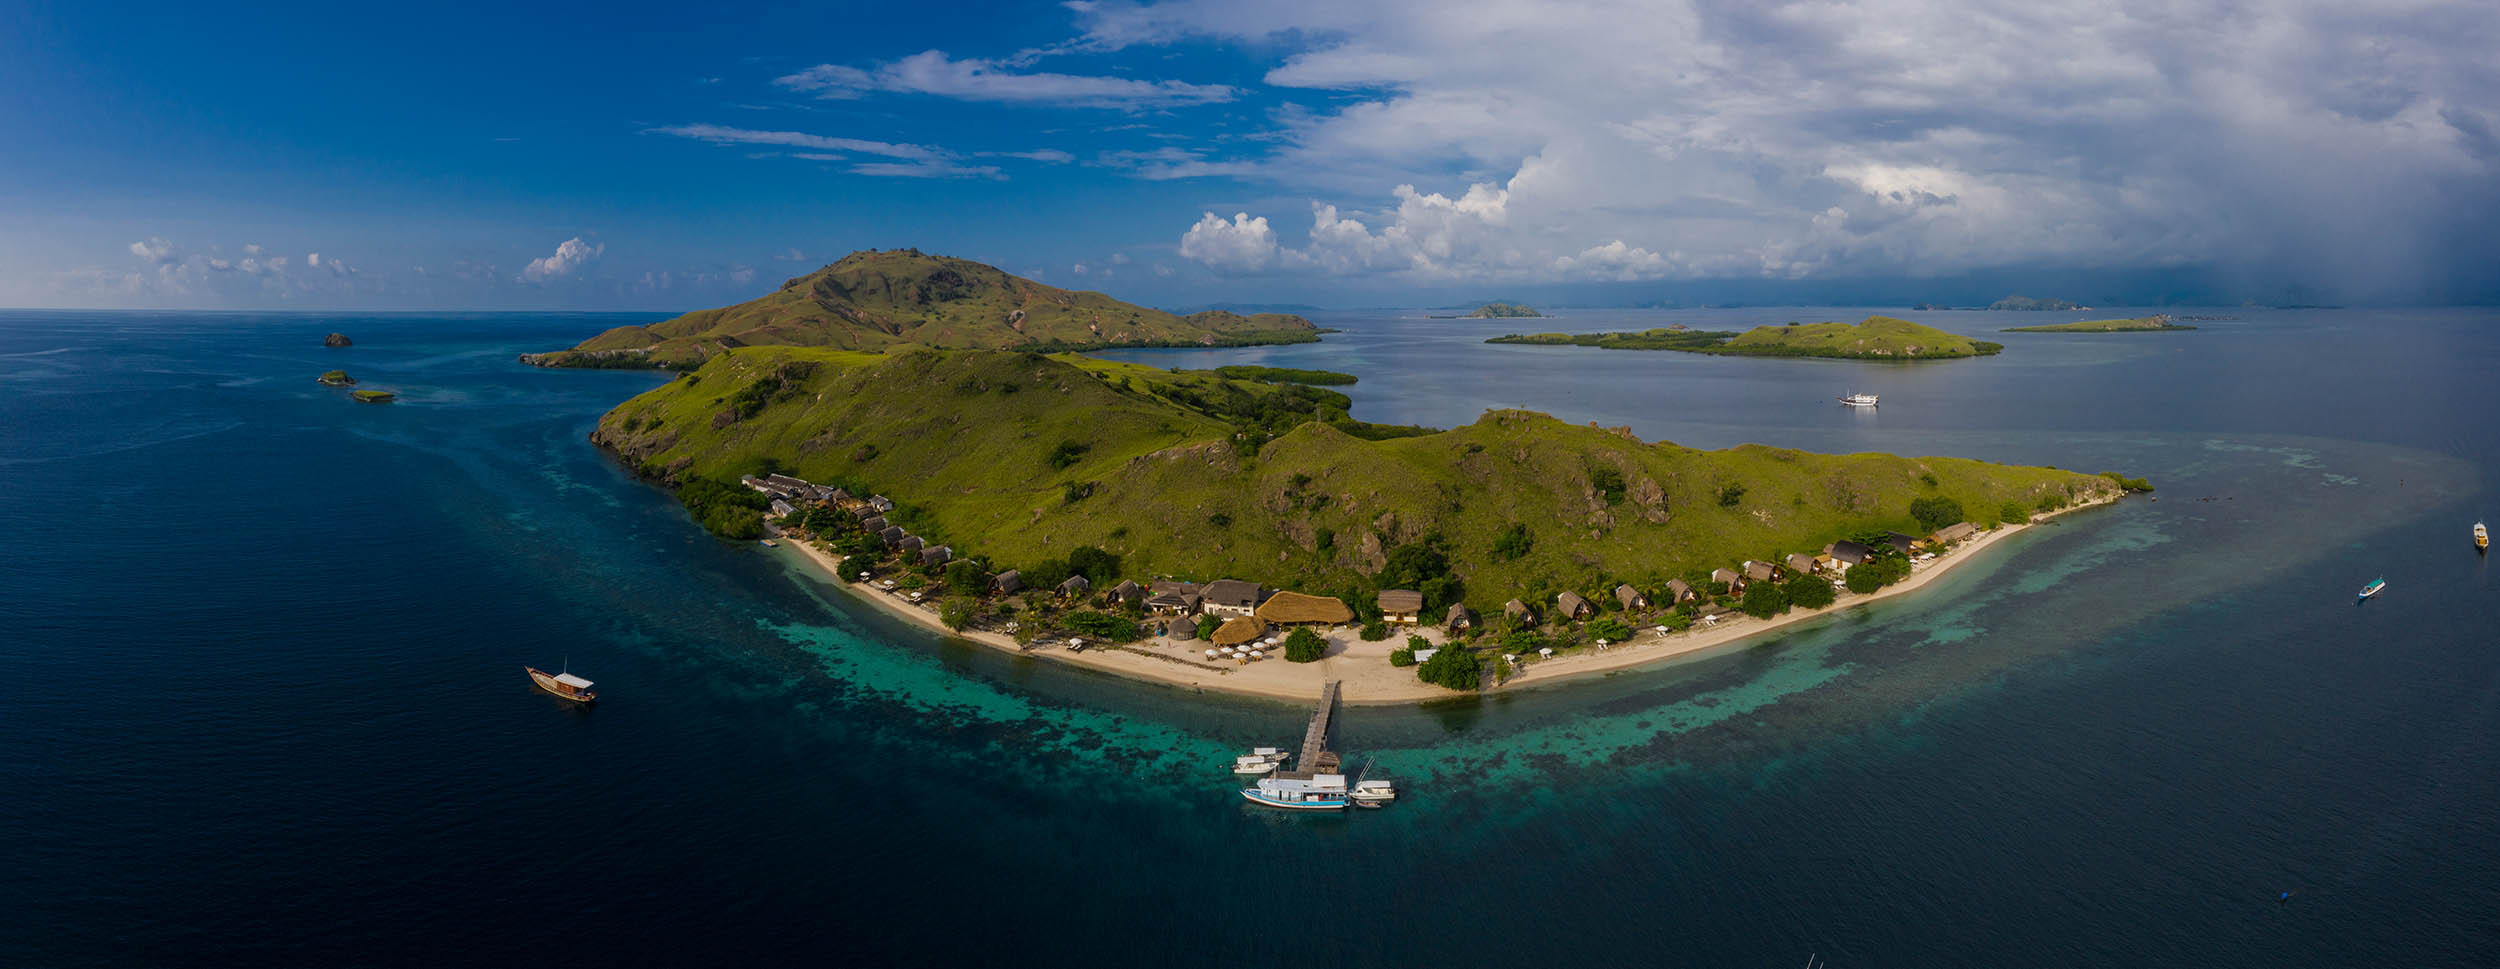 Komodo Resort Aerial Perspective